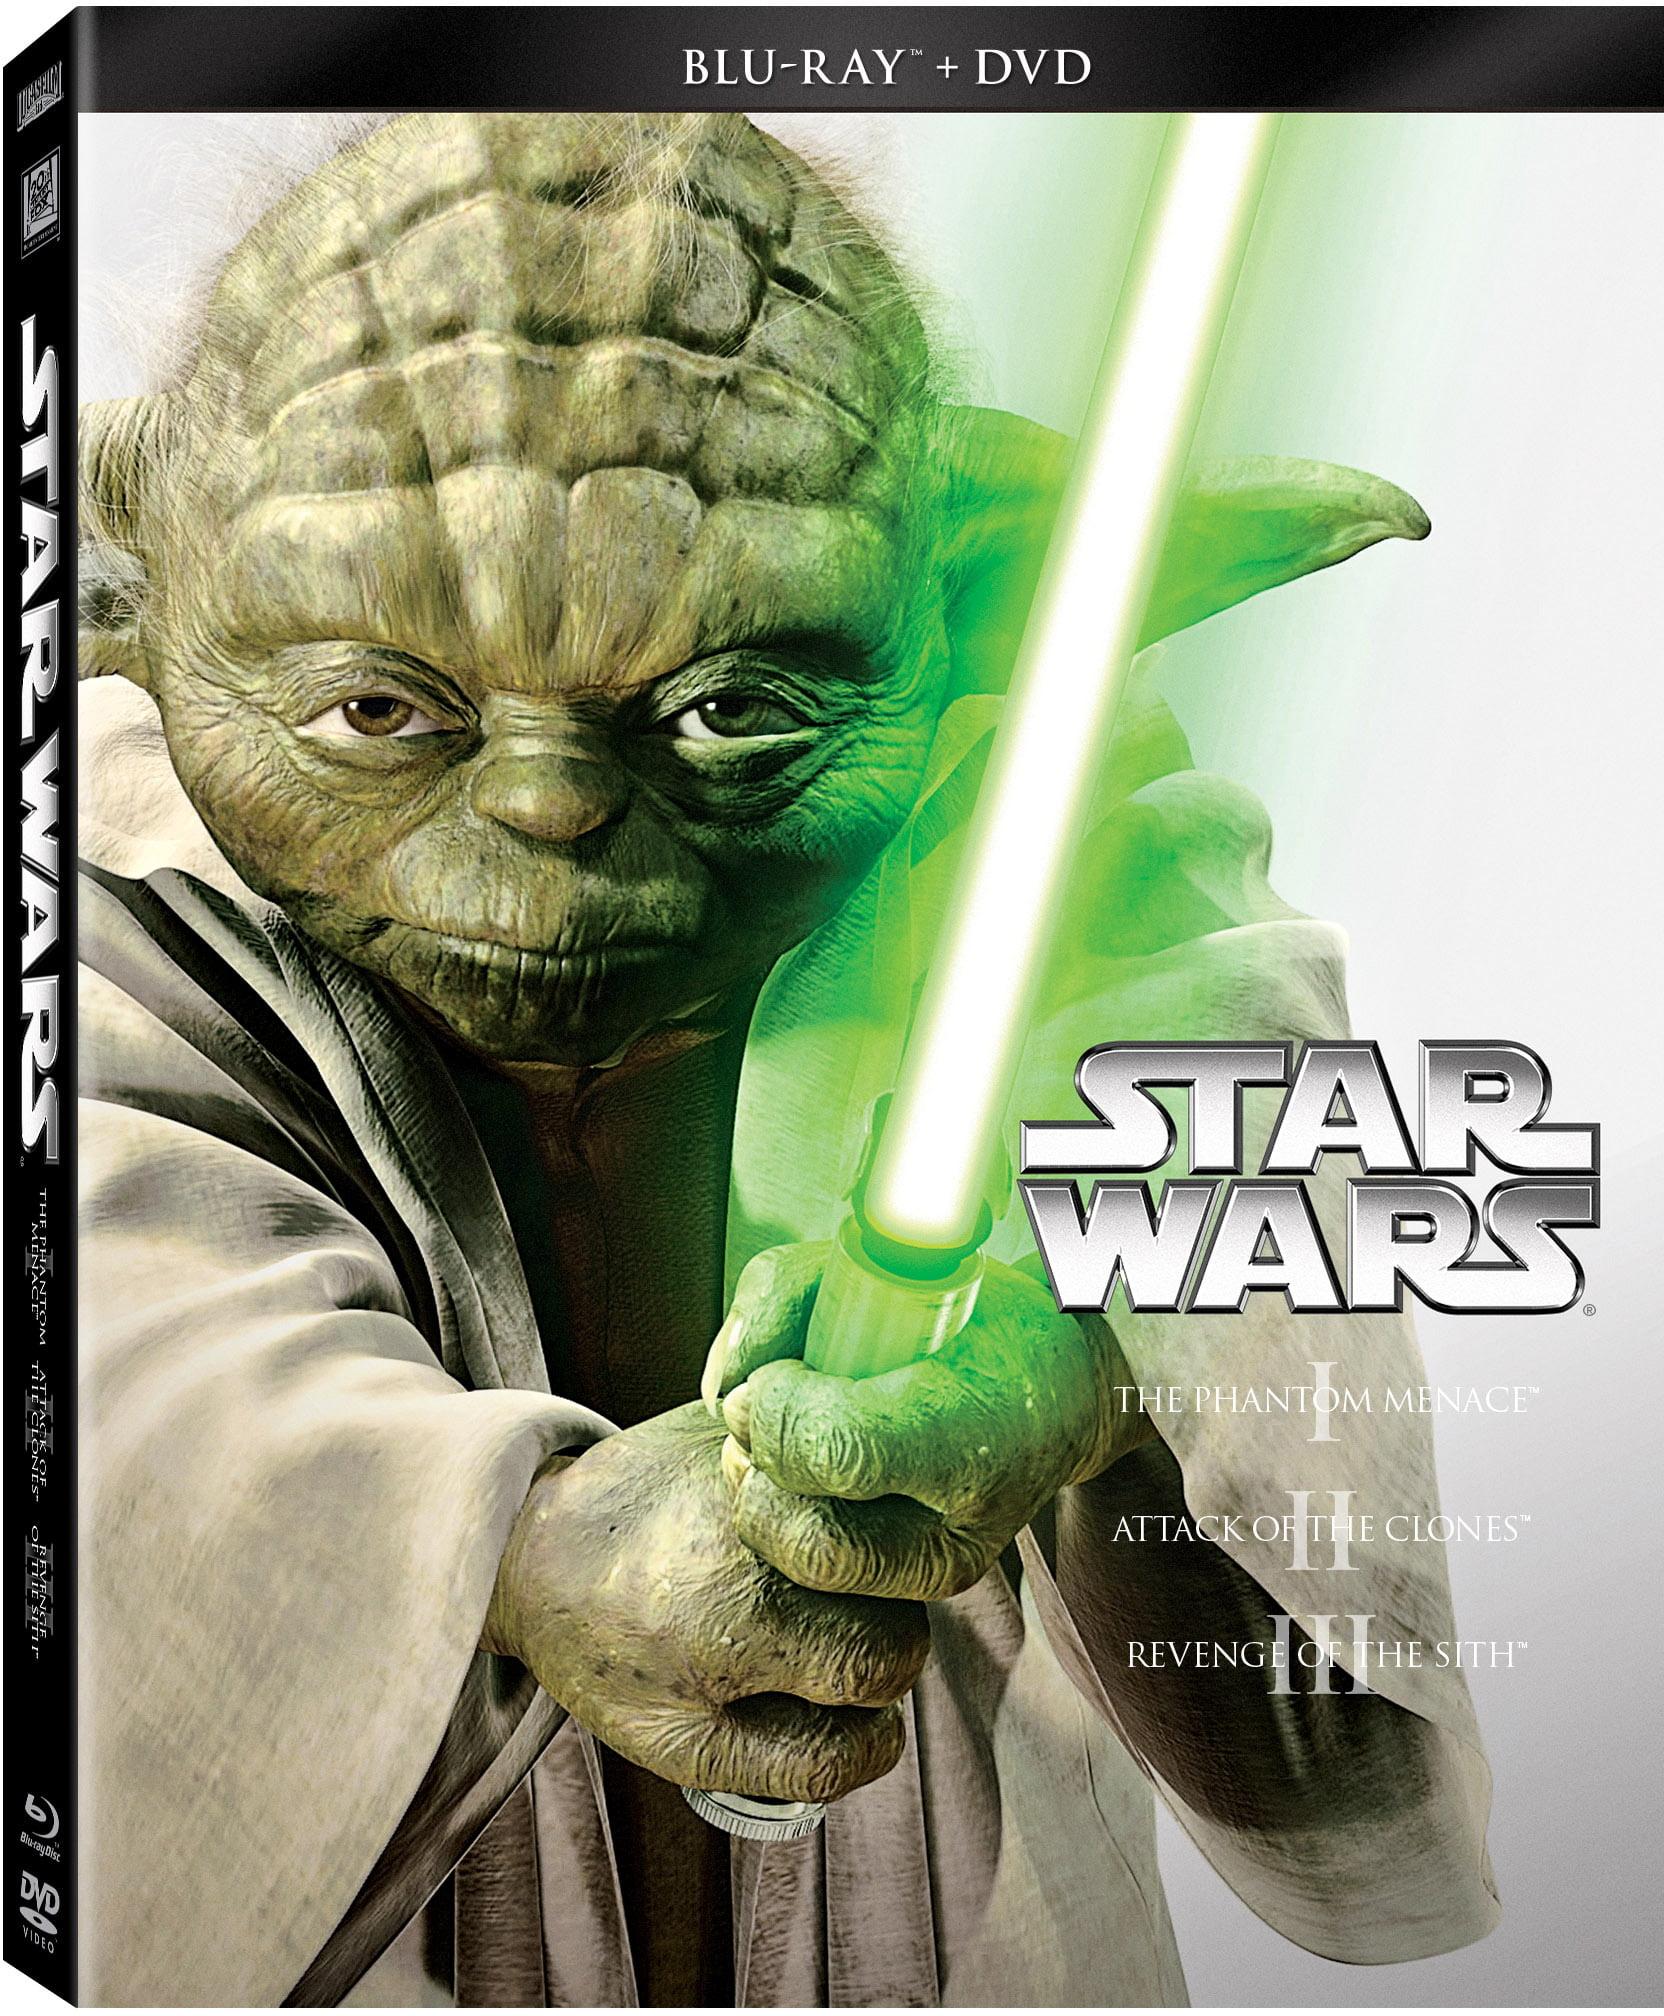 Star Wars Trilogy: Episodes I-III (Blu-ray + DVD) by